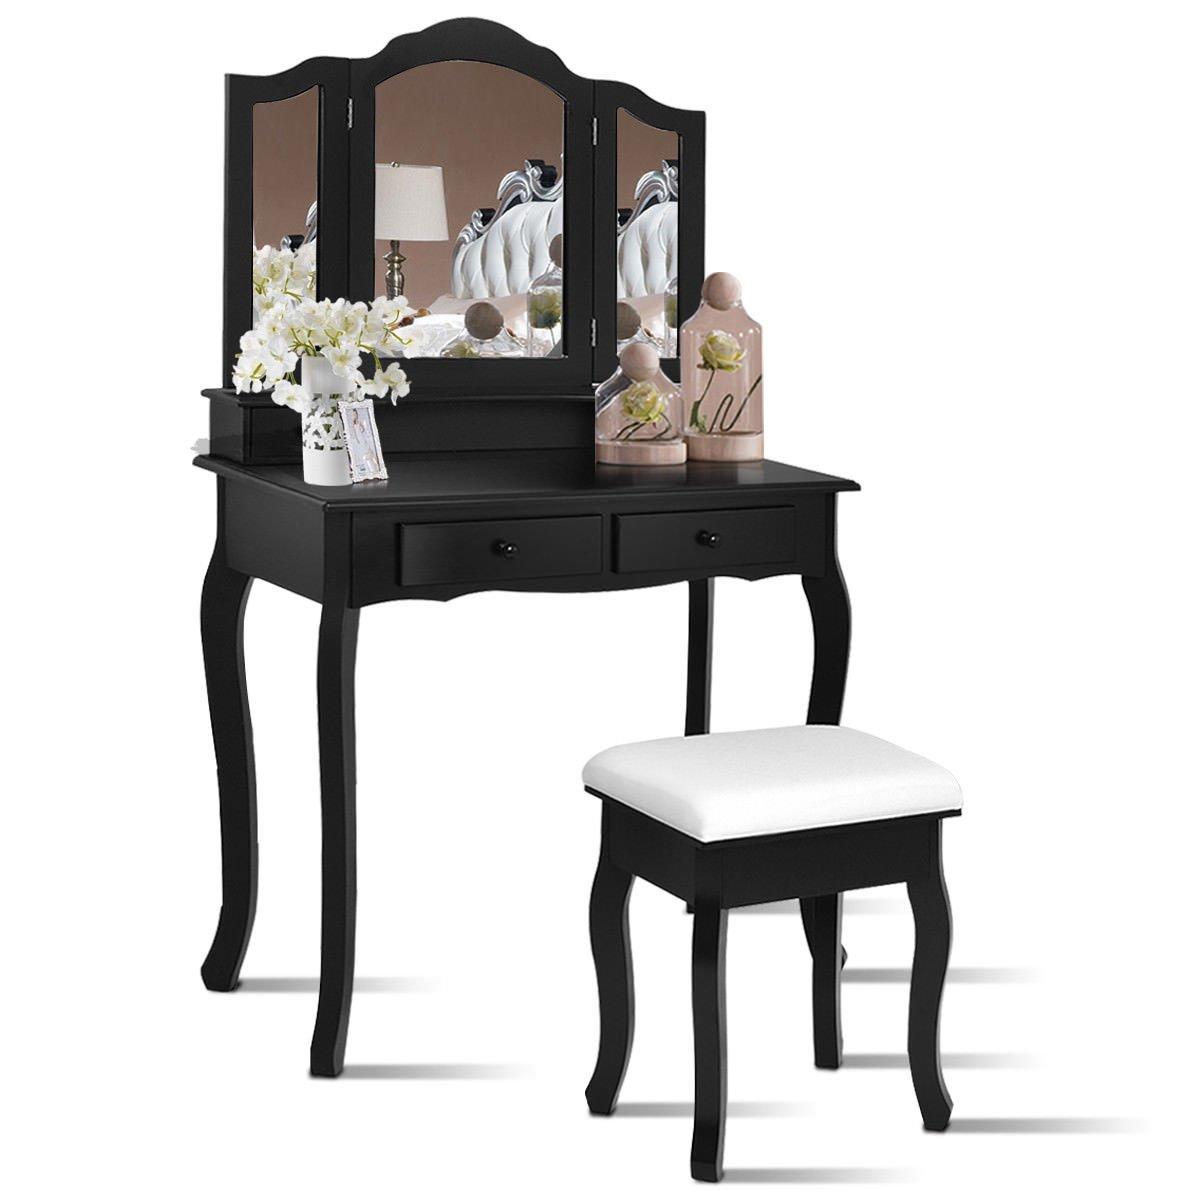 Giantex Bathroom Vanity Set Tri-Folding Mirror W/Bench 4 Drawer Dressing Table Make-up Vanity Table Set (Black)